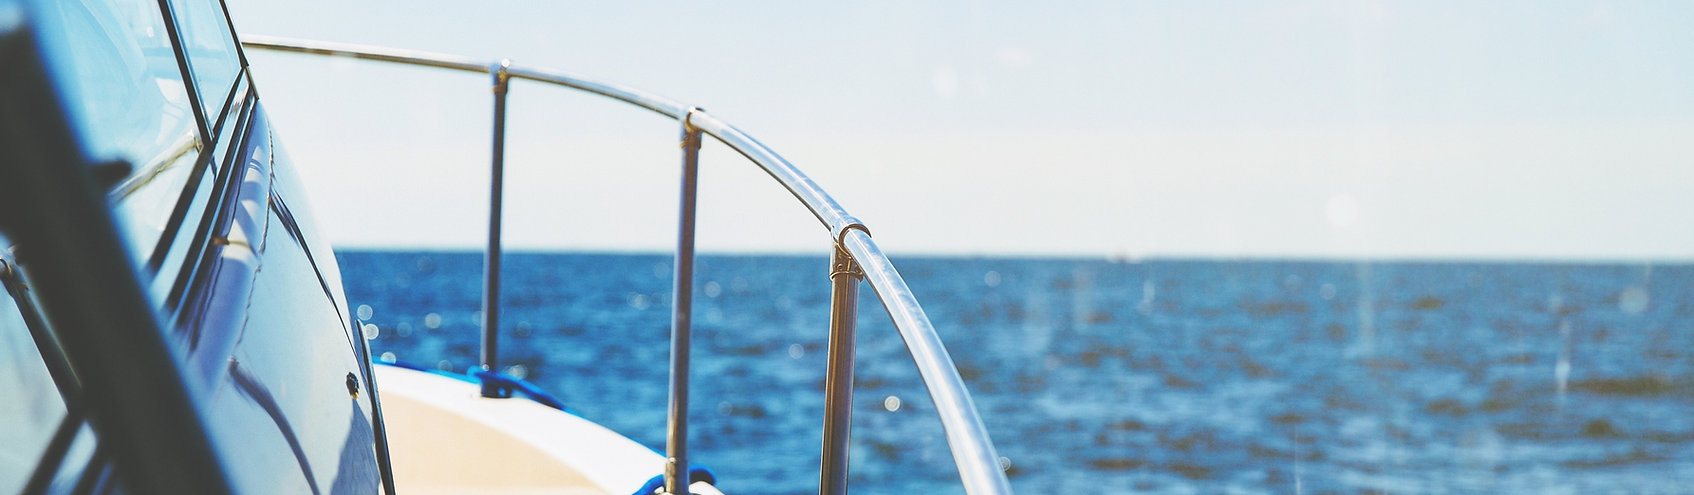 Maritie Yacht Services